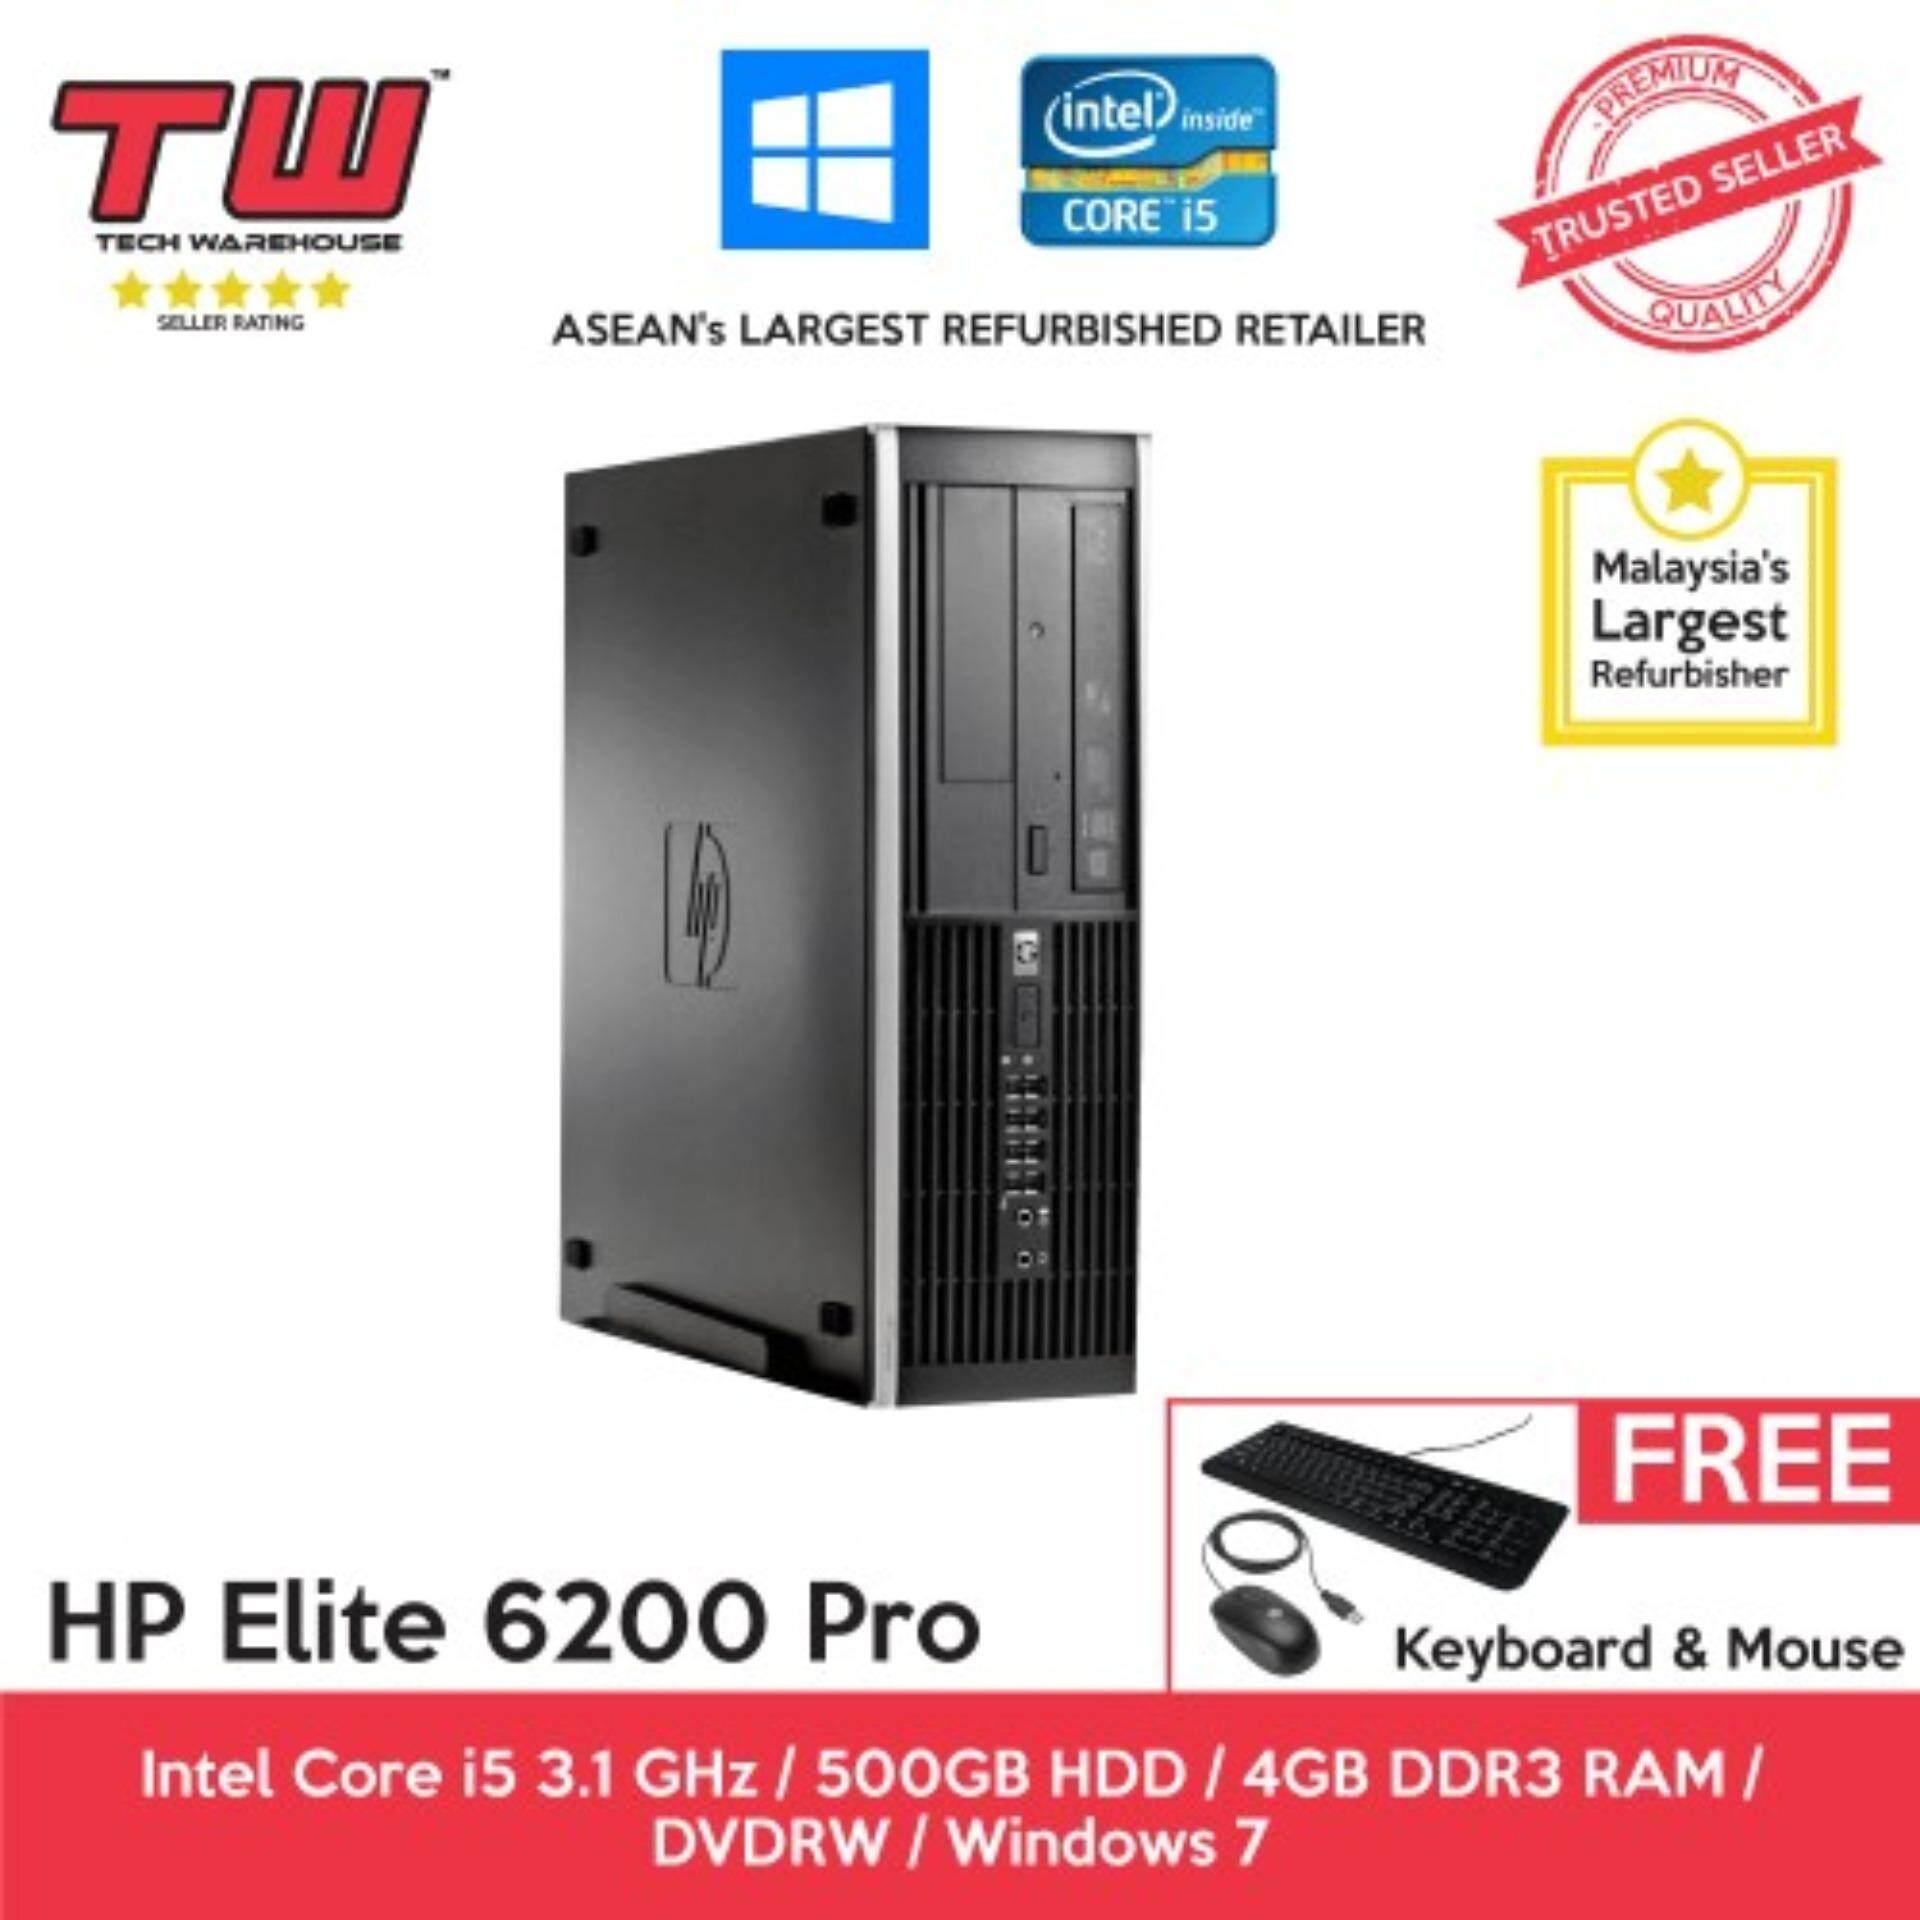 HP Elite 6200 Pro Core i5 4GB RAM 500GB HDD Windows 7 Pro